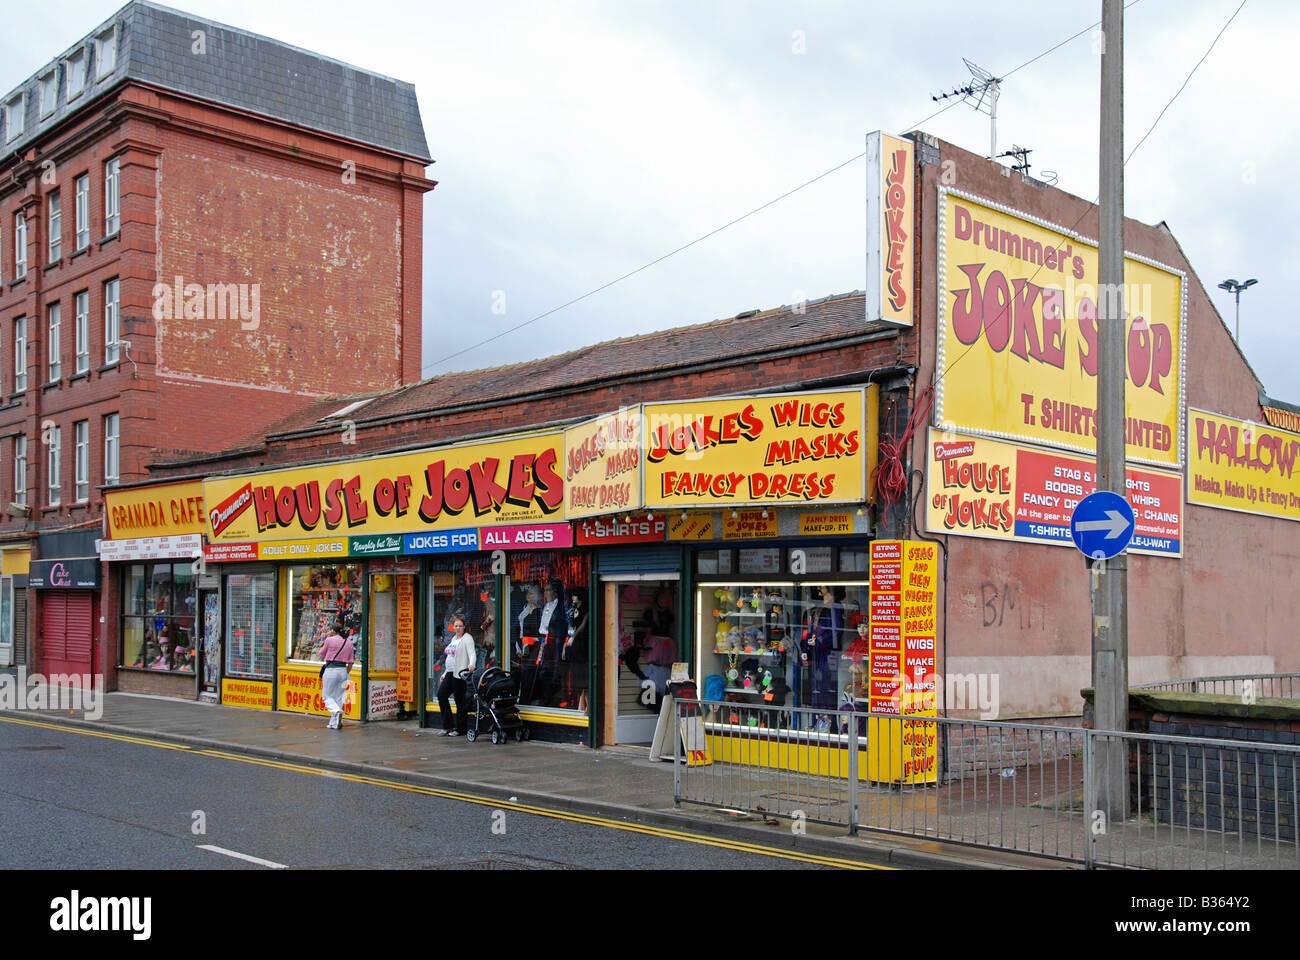 a large joke shop in blackpool,england,uk - Stock Image